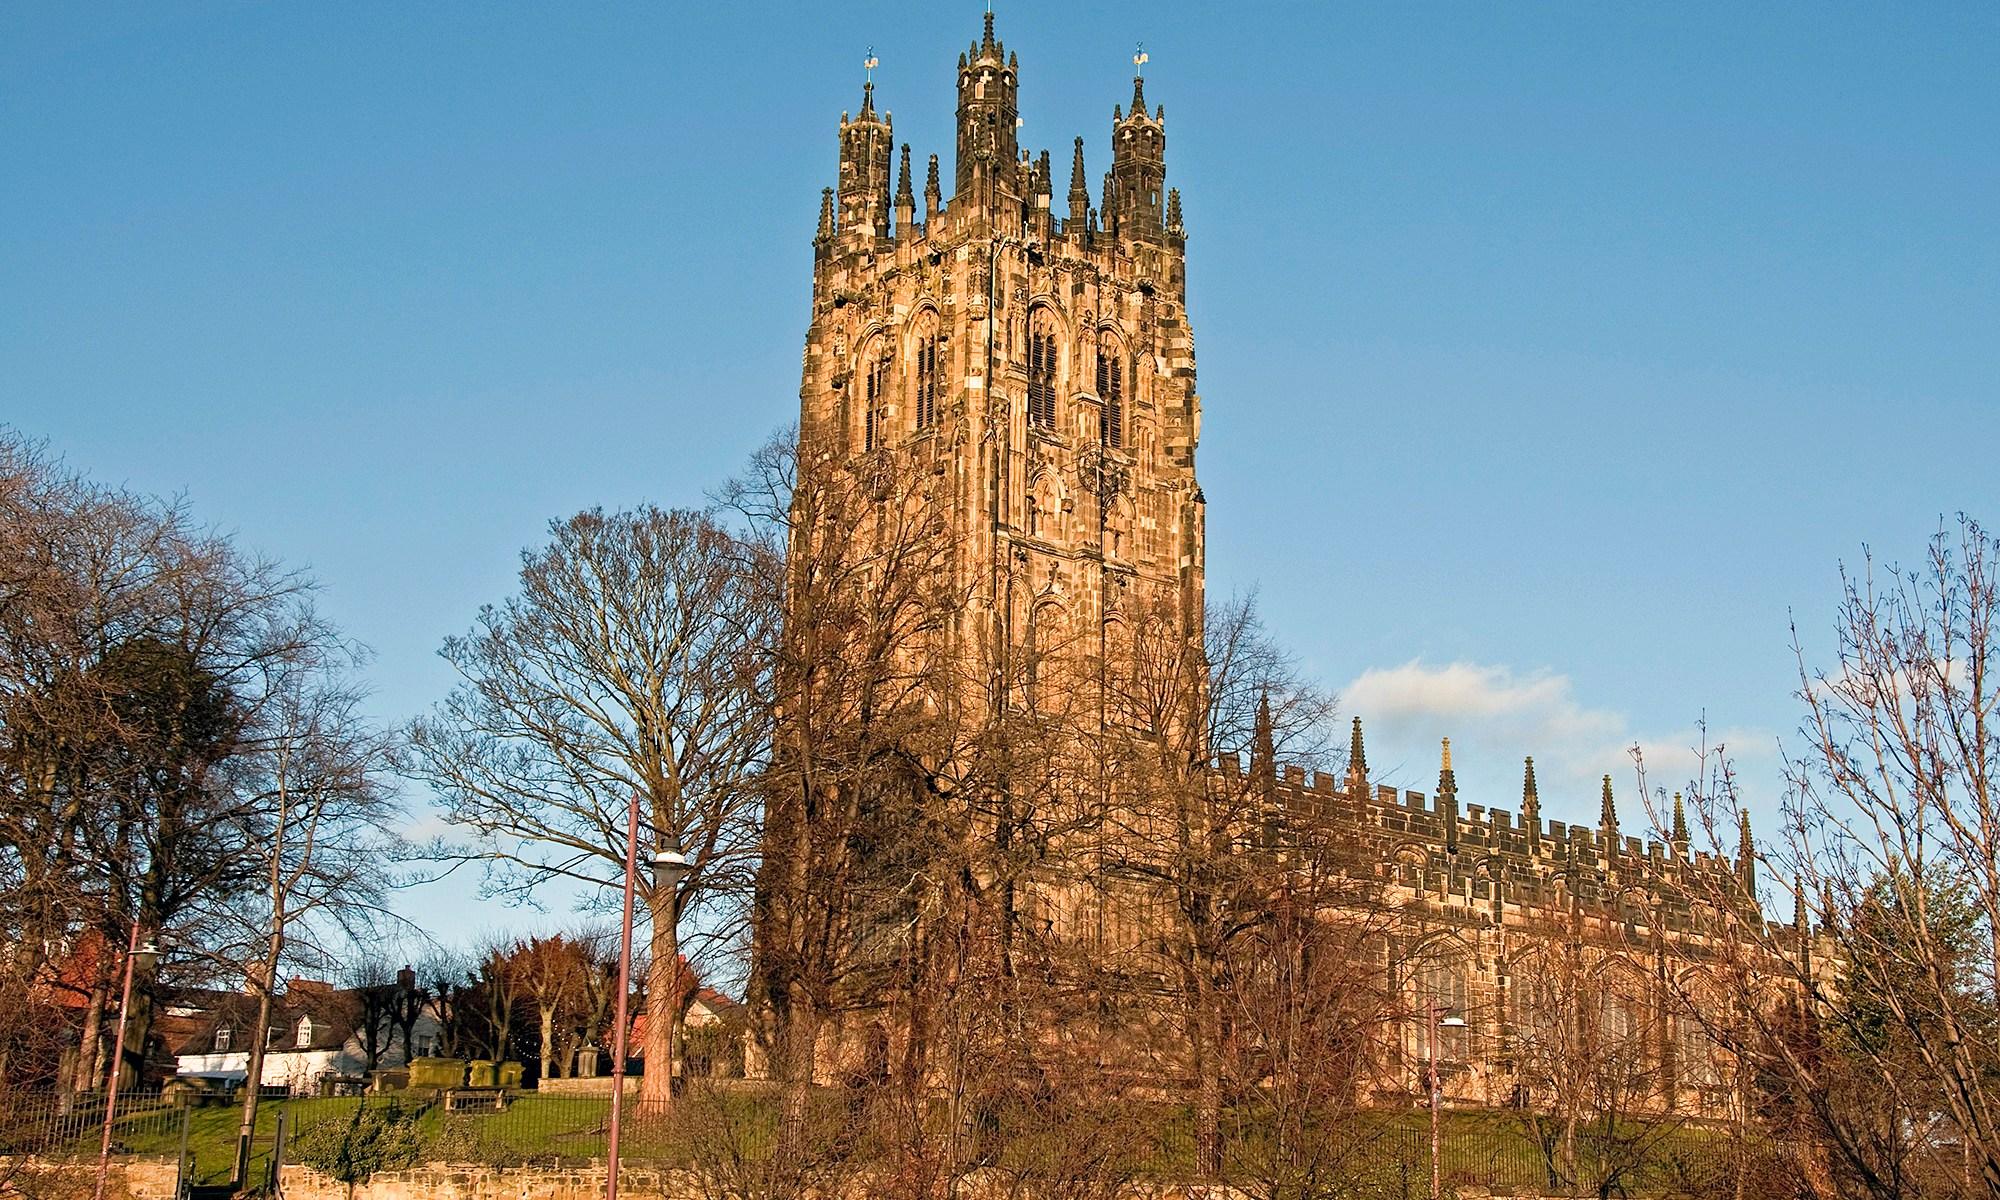 St. Giles Church Wrexham, Wales